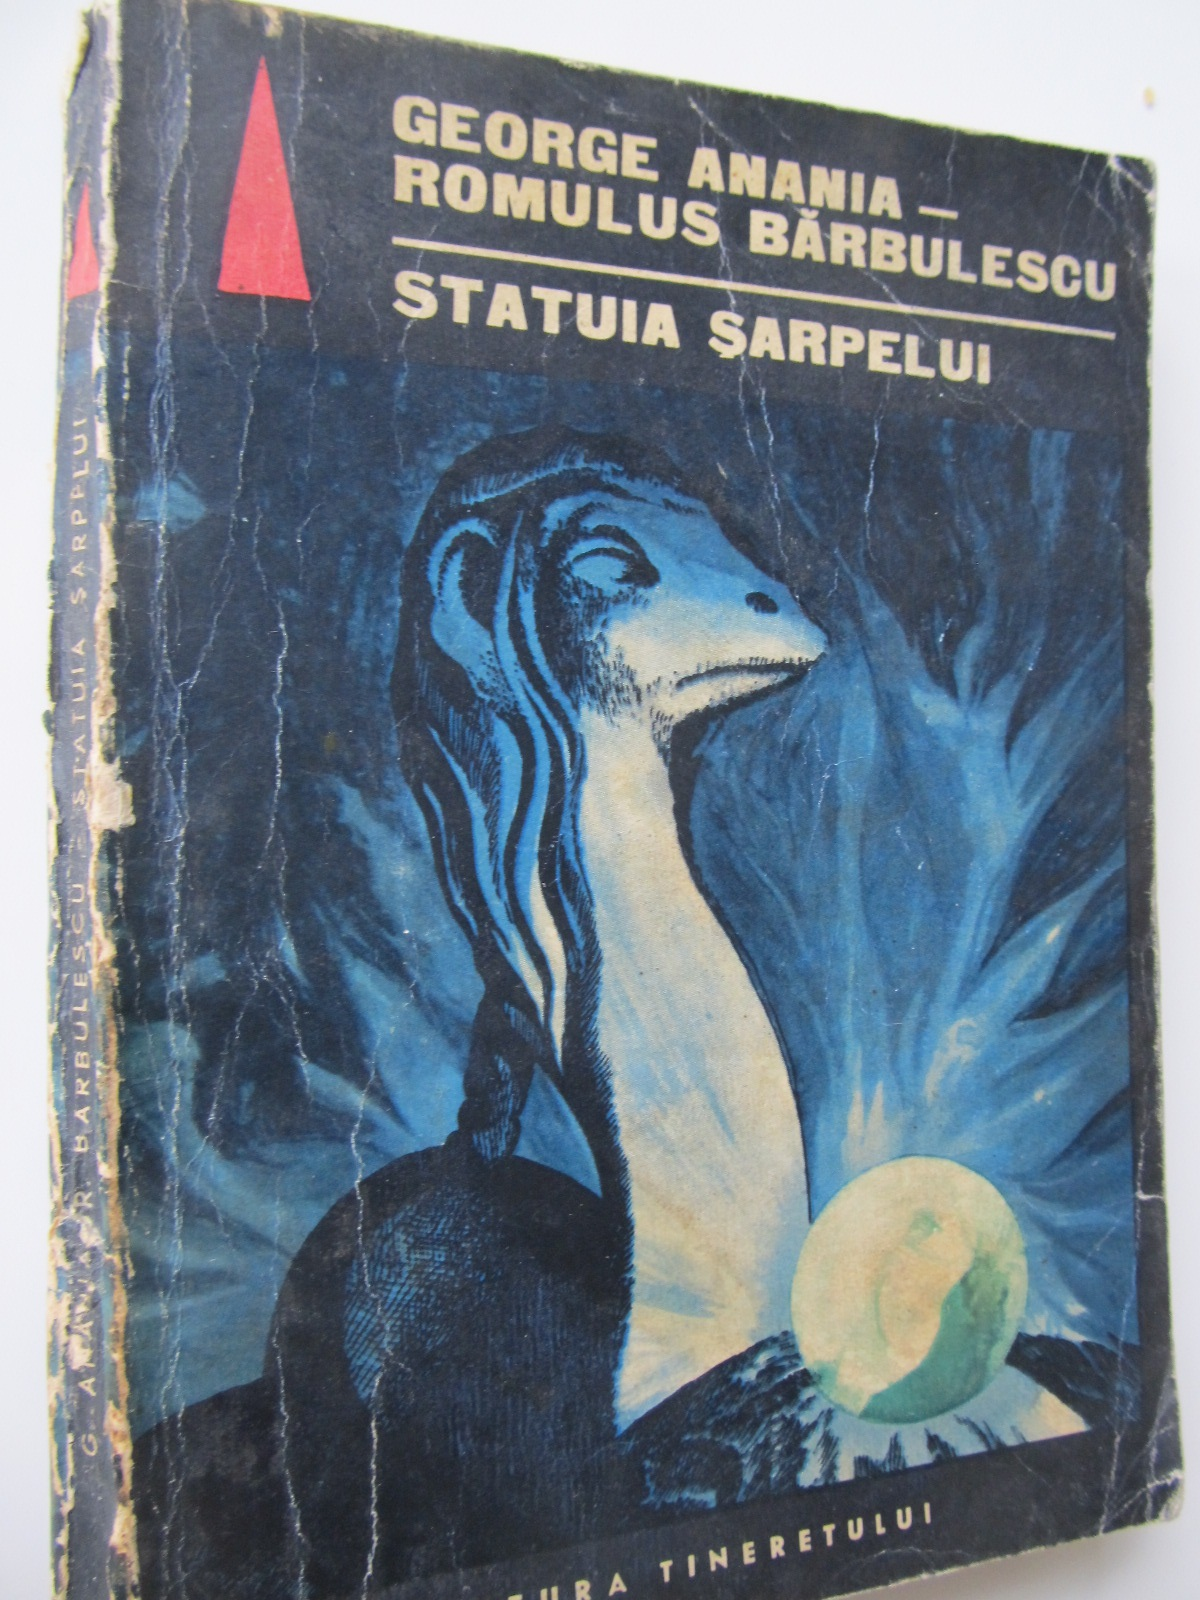 Statuia sarpelui - George Anania , Romulus Barbulescu | Detalii carte